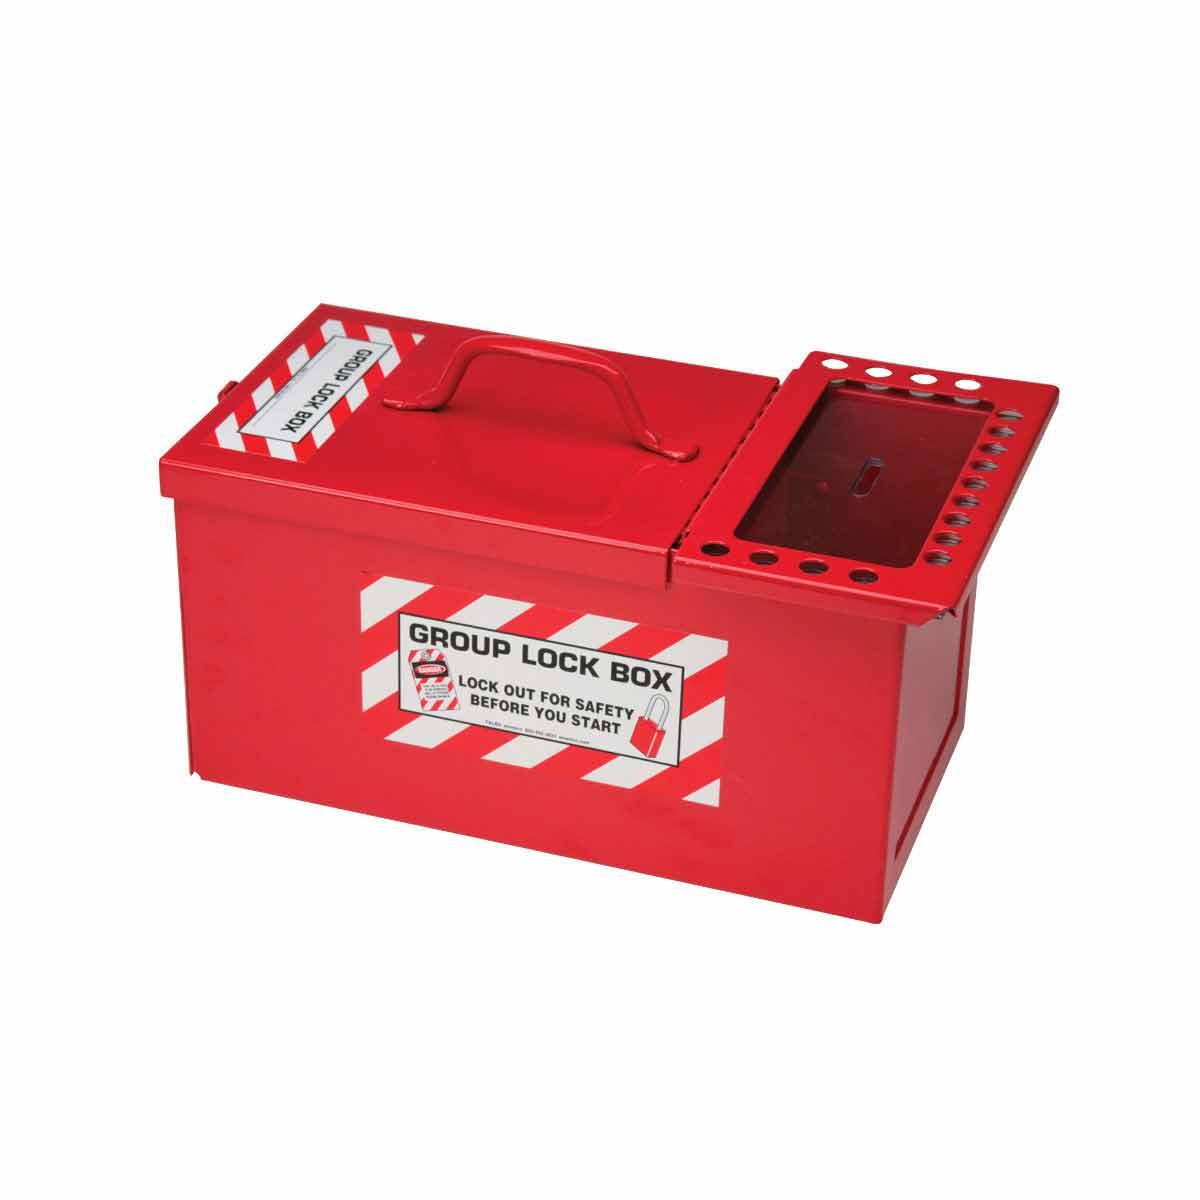 Brady® 105716 Empty Heavy Duty Portable Group Lockout Box, 17 Padlocks, Black/White on Red, 6 in H x 7-1/2 in W x 12-1/2 in D